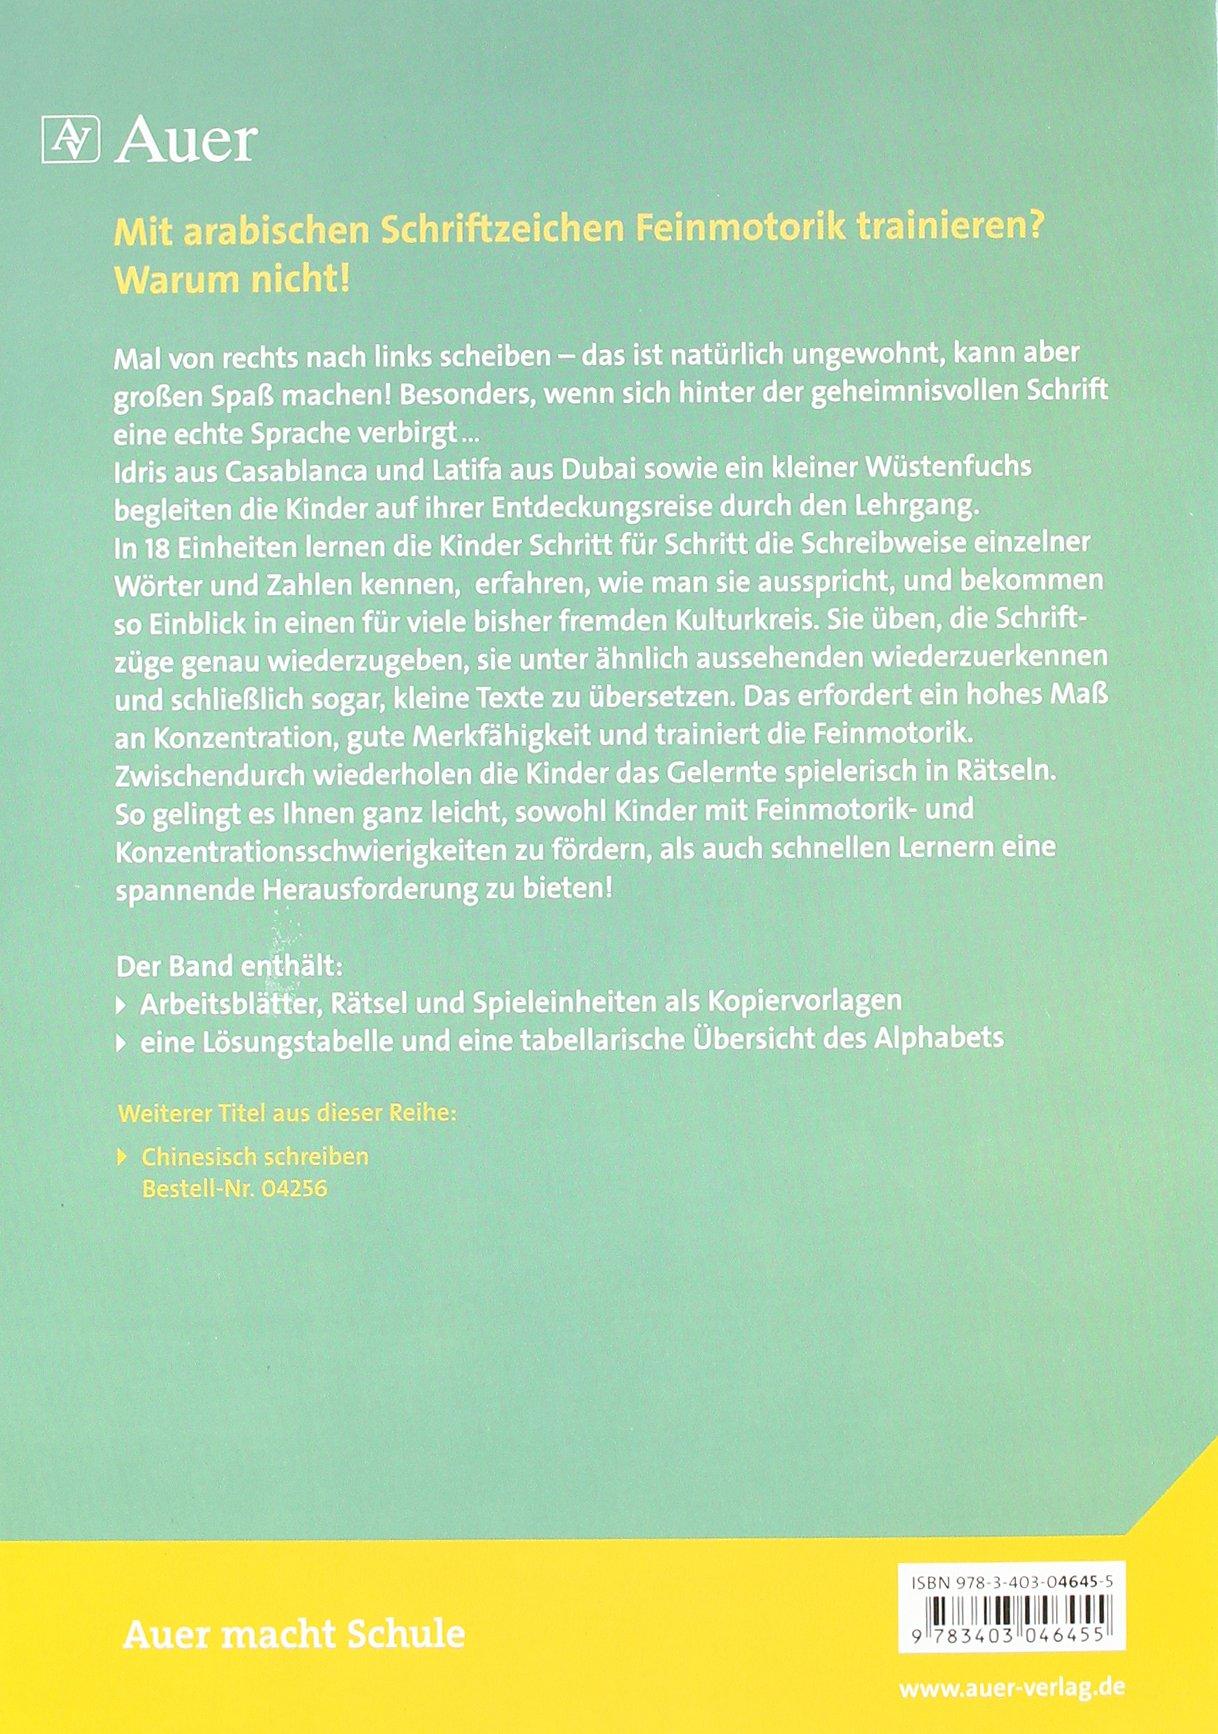 Schön Alphabet Bestell Arbeitsblatt Ideen - Super Lehrer ...